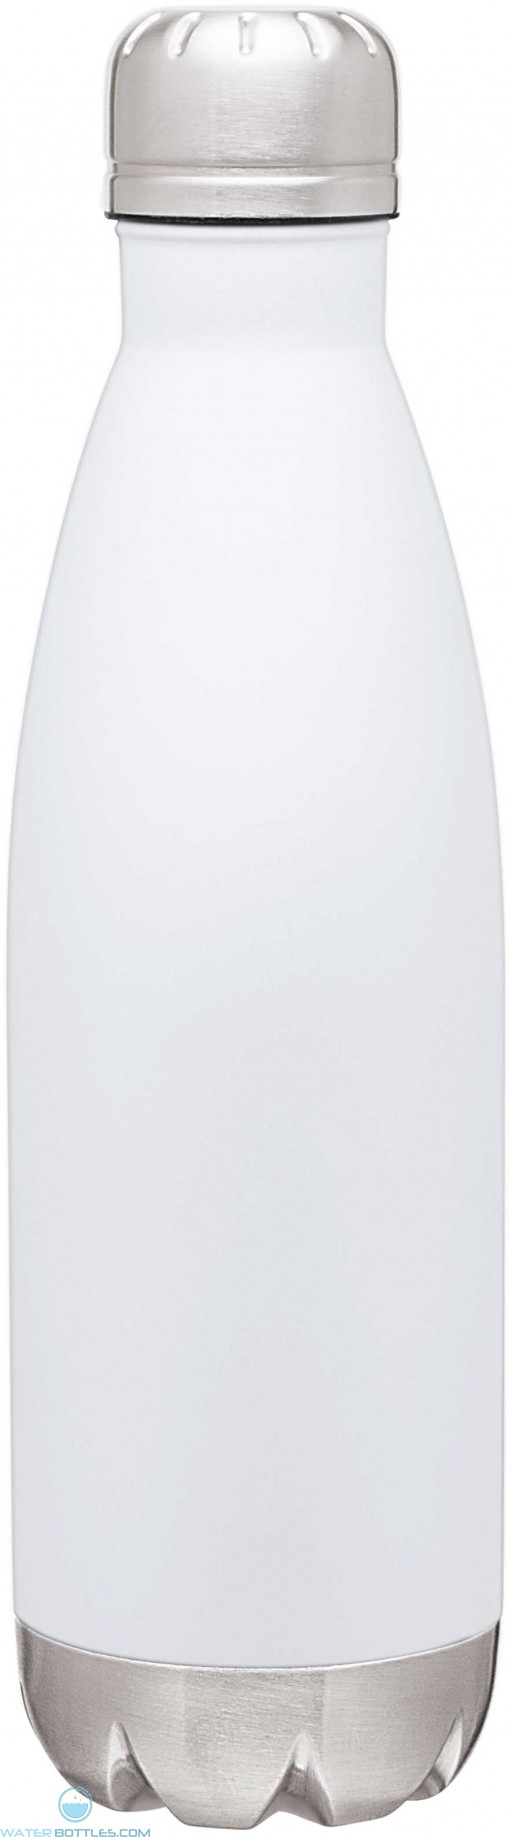 H2Go Force Thermal Bottles | 17 oz - White